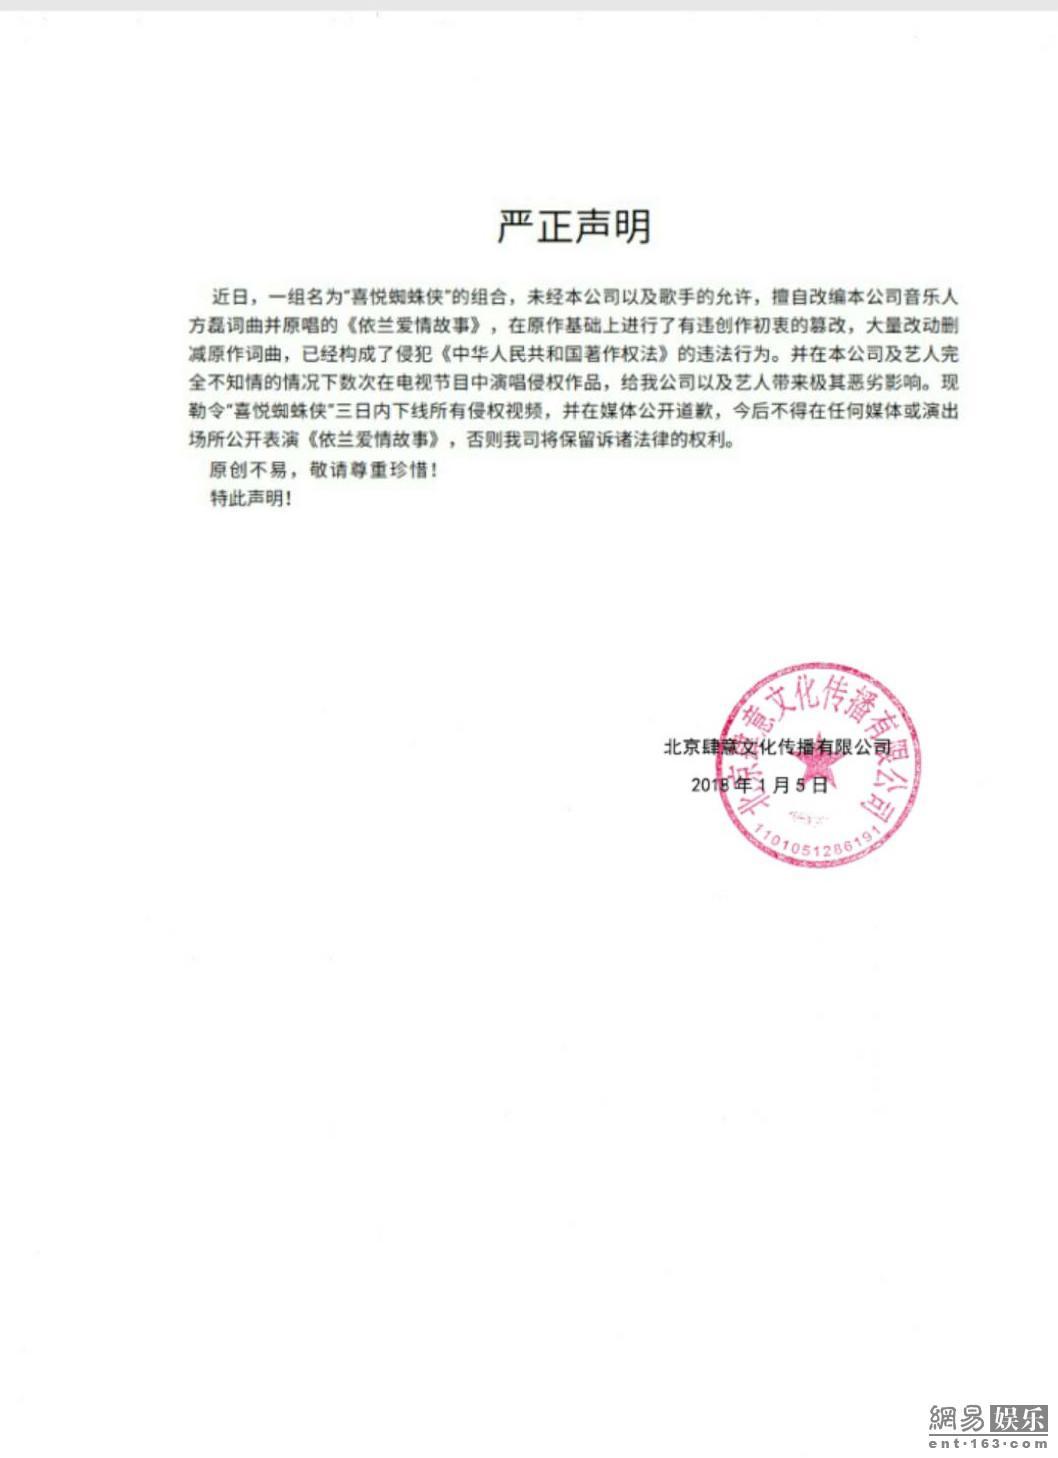 http://djpanaaz.com/wenhuayichan/214163.html